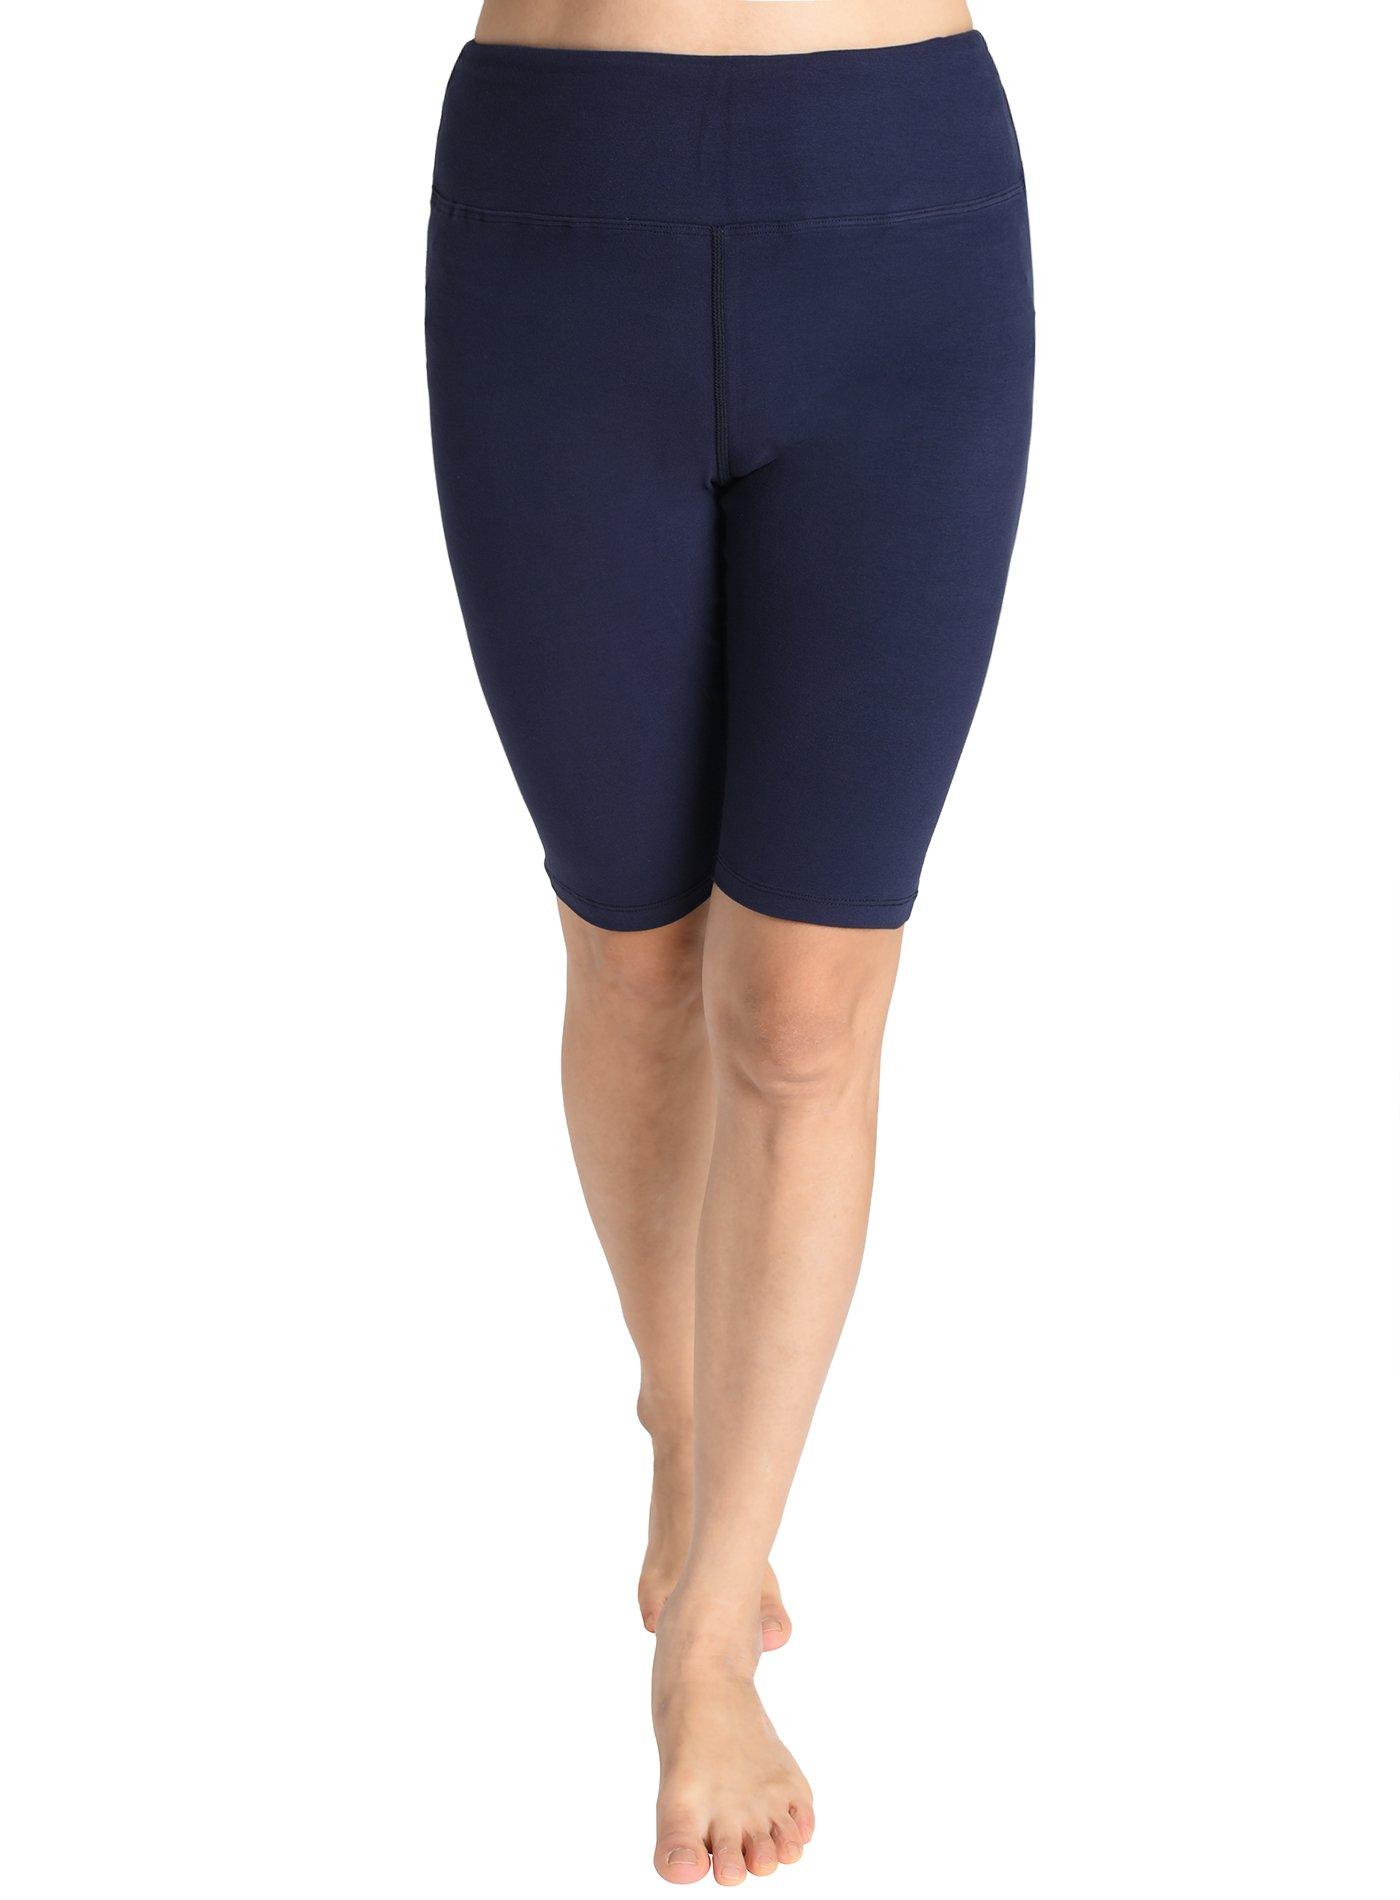 bac5c9f3da Galleon - Weintee Women's Cotton Spandex Yoga Shorts Workout Gym Shorts XL  Navy